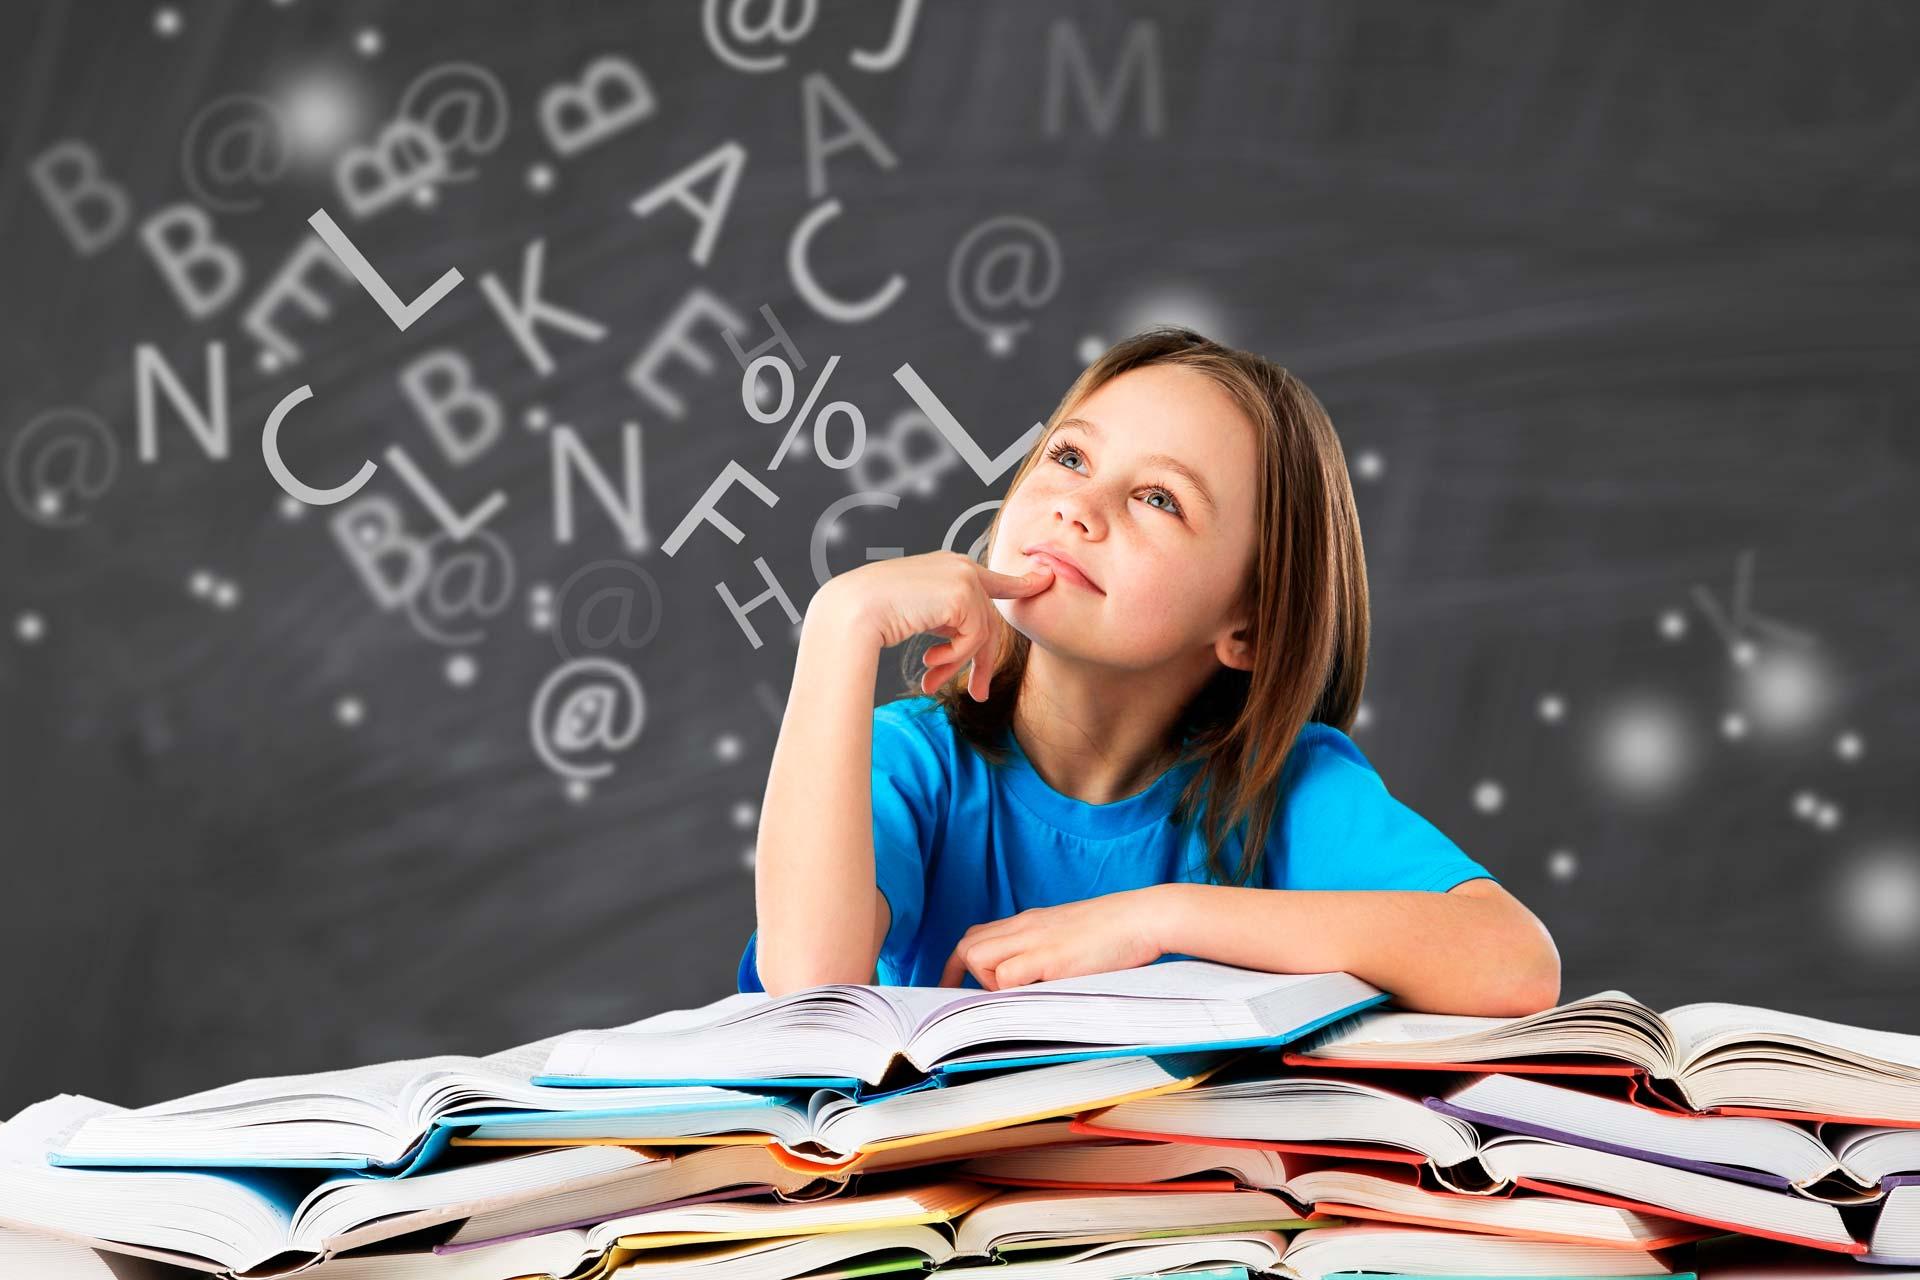 Teach & Coach - Citotraining